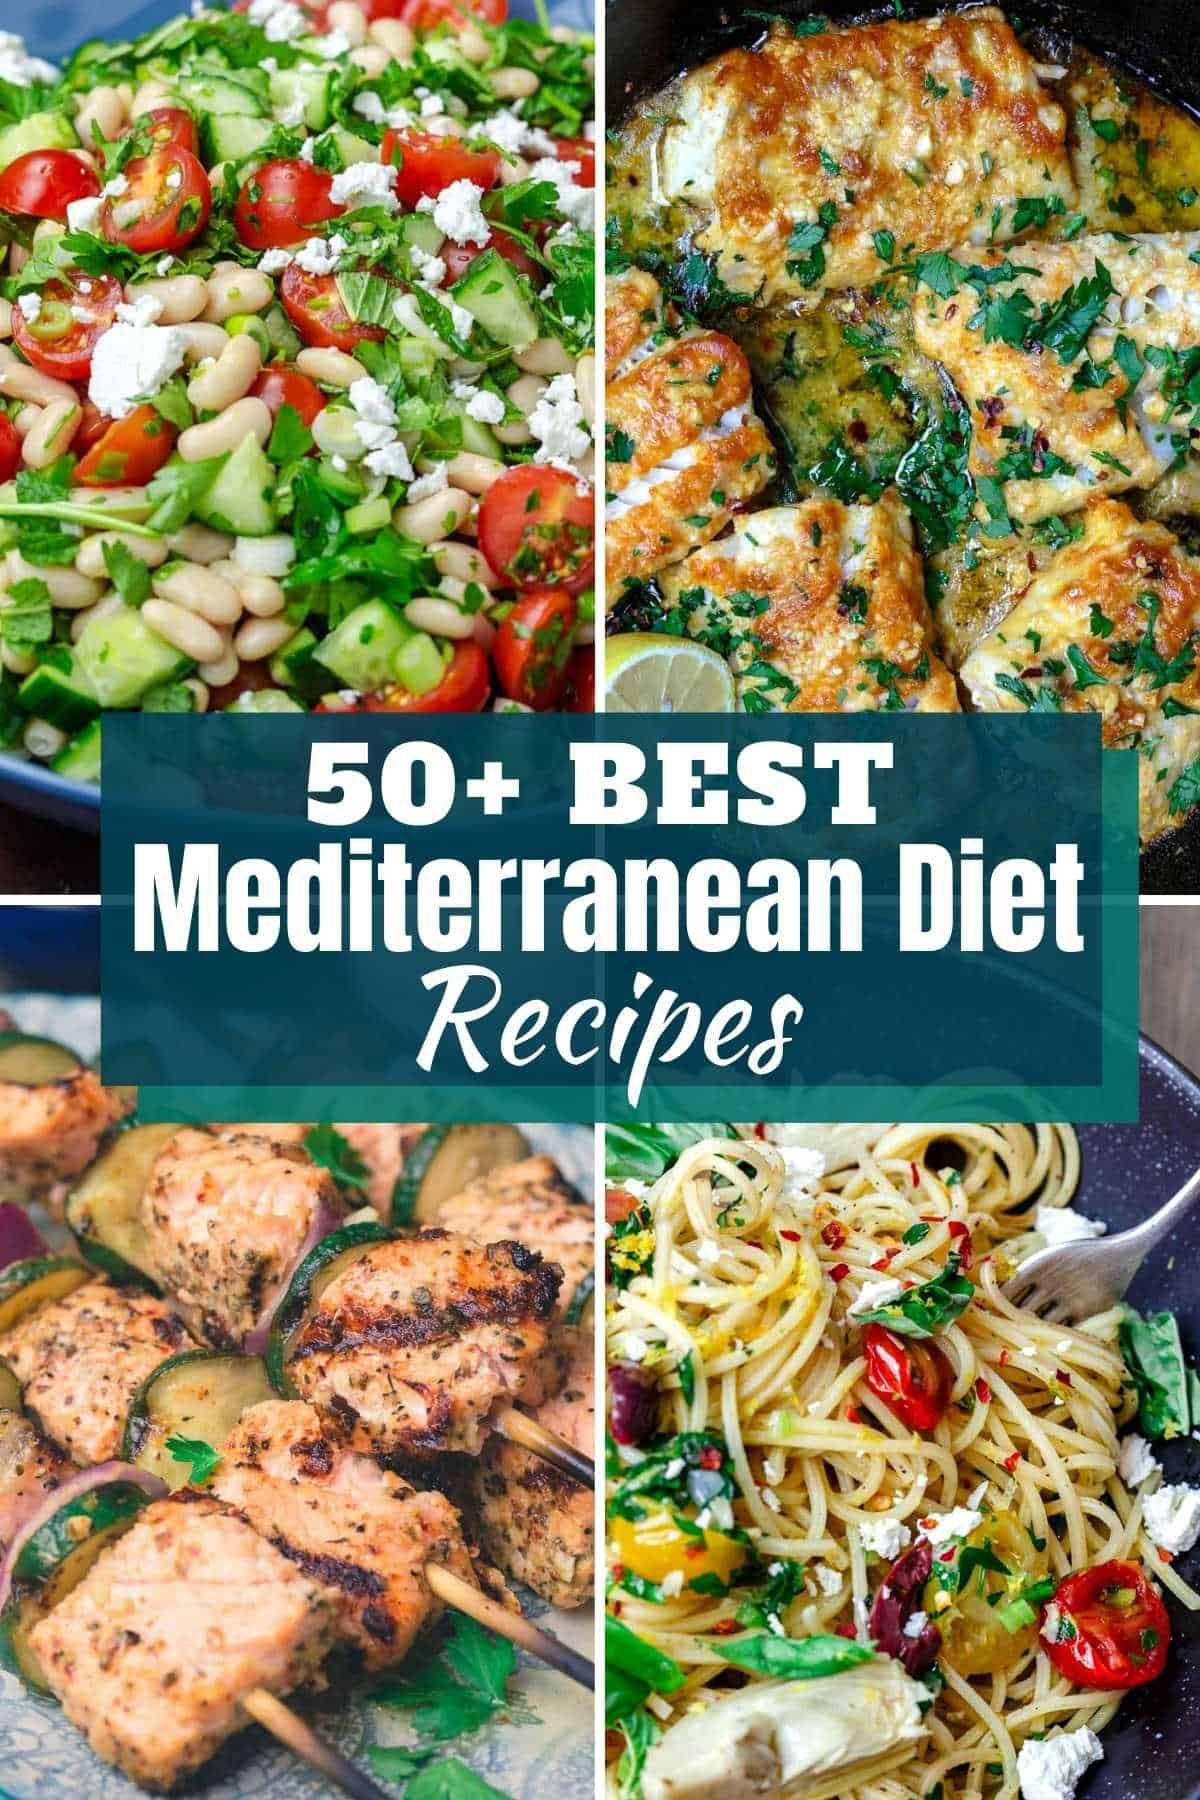 50+ Mediterranean diet recipes you'll love!